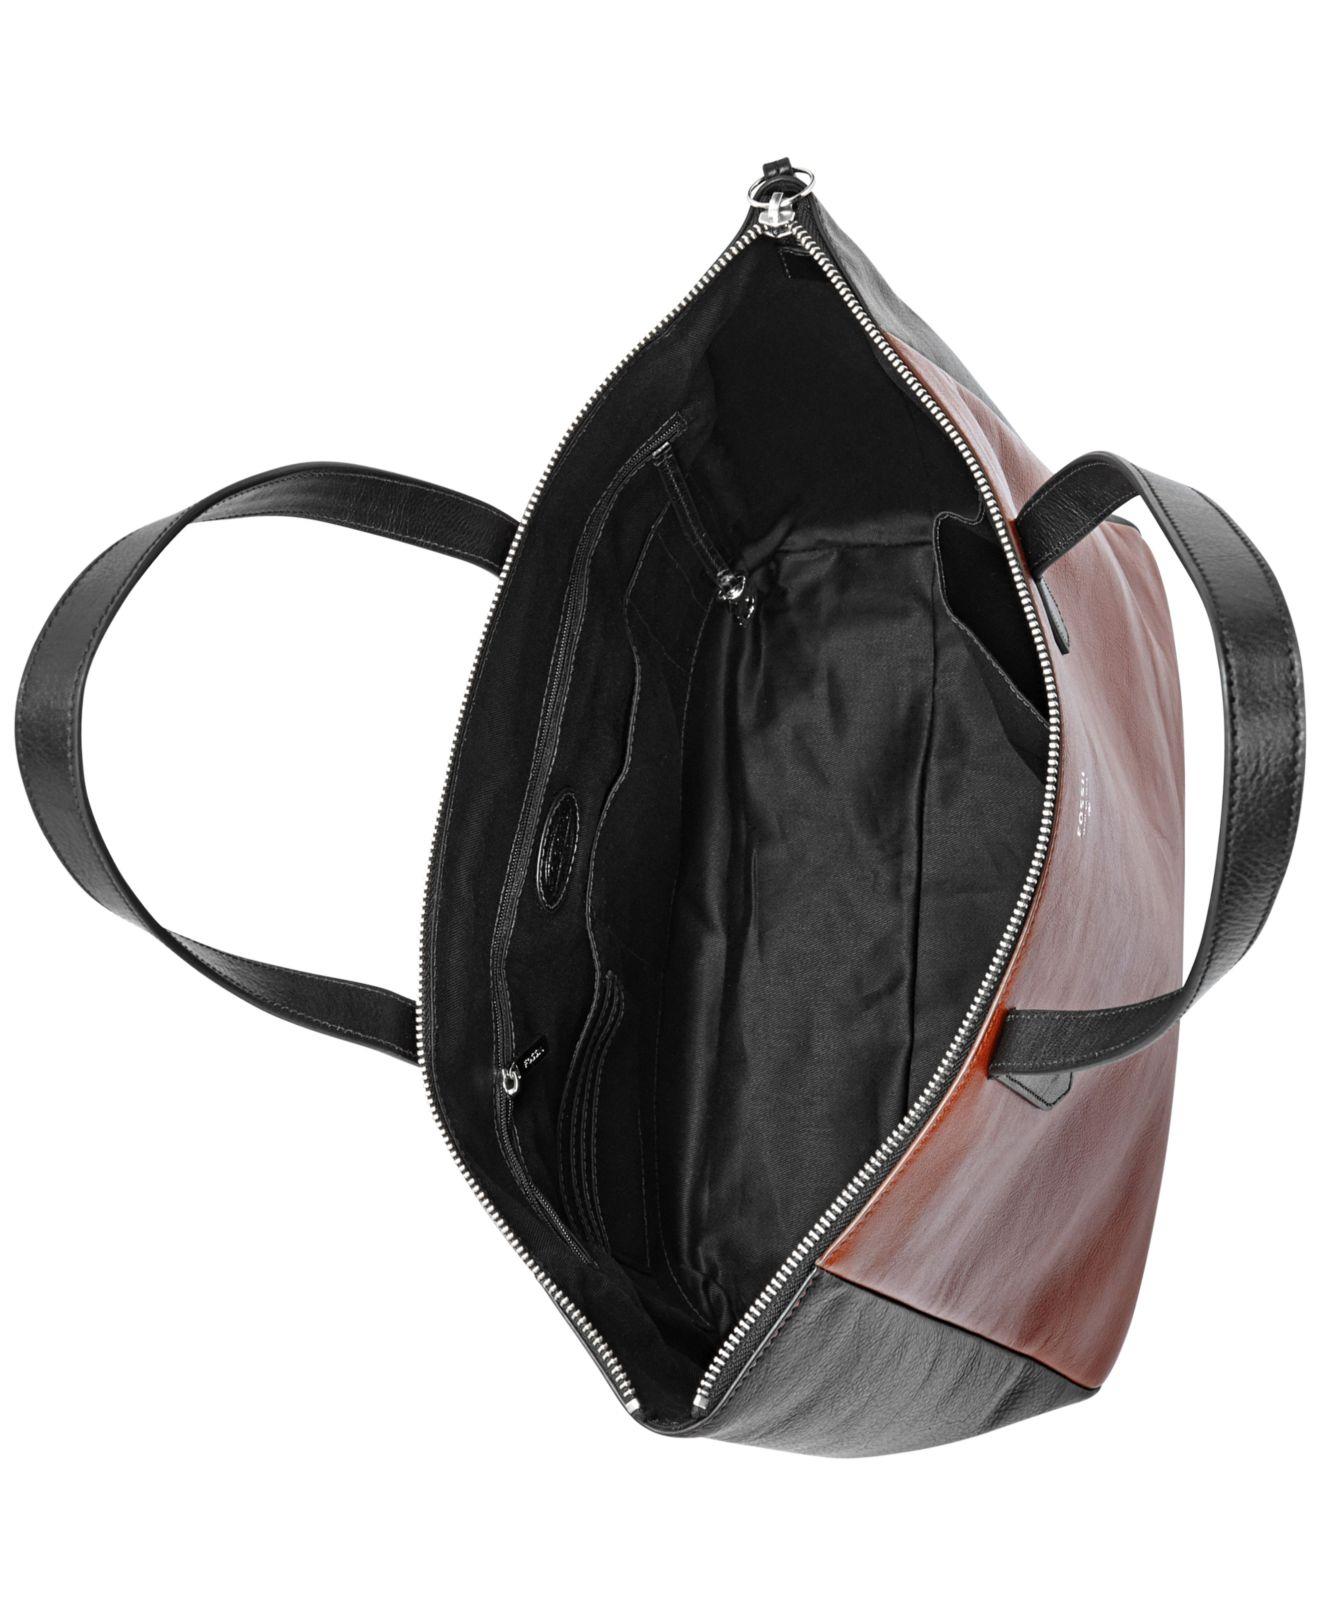 Fossil Sydney Shopper Brown Zb 5491200 Daftar Harga Terlengkap Dawson Multifunction Black Sl 6675001 Jual Tas Source Raisin Patchwork Leather